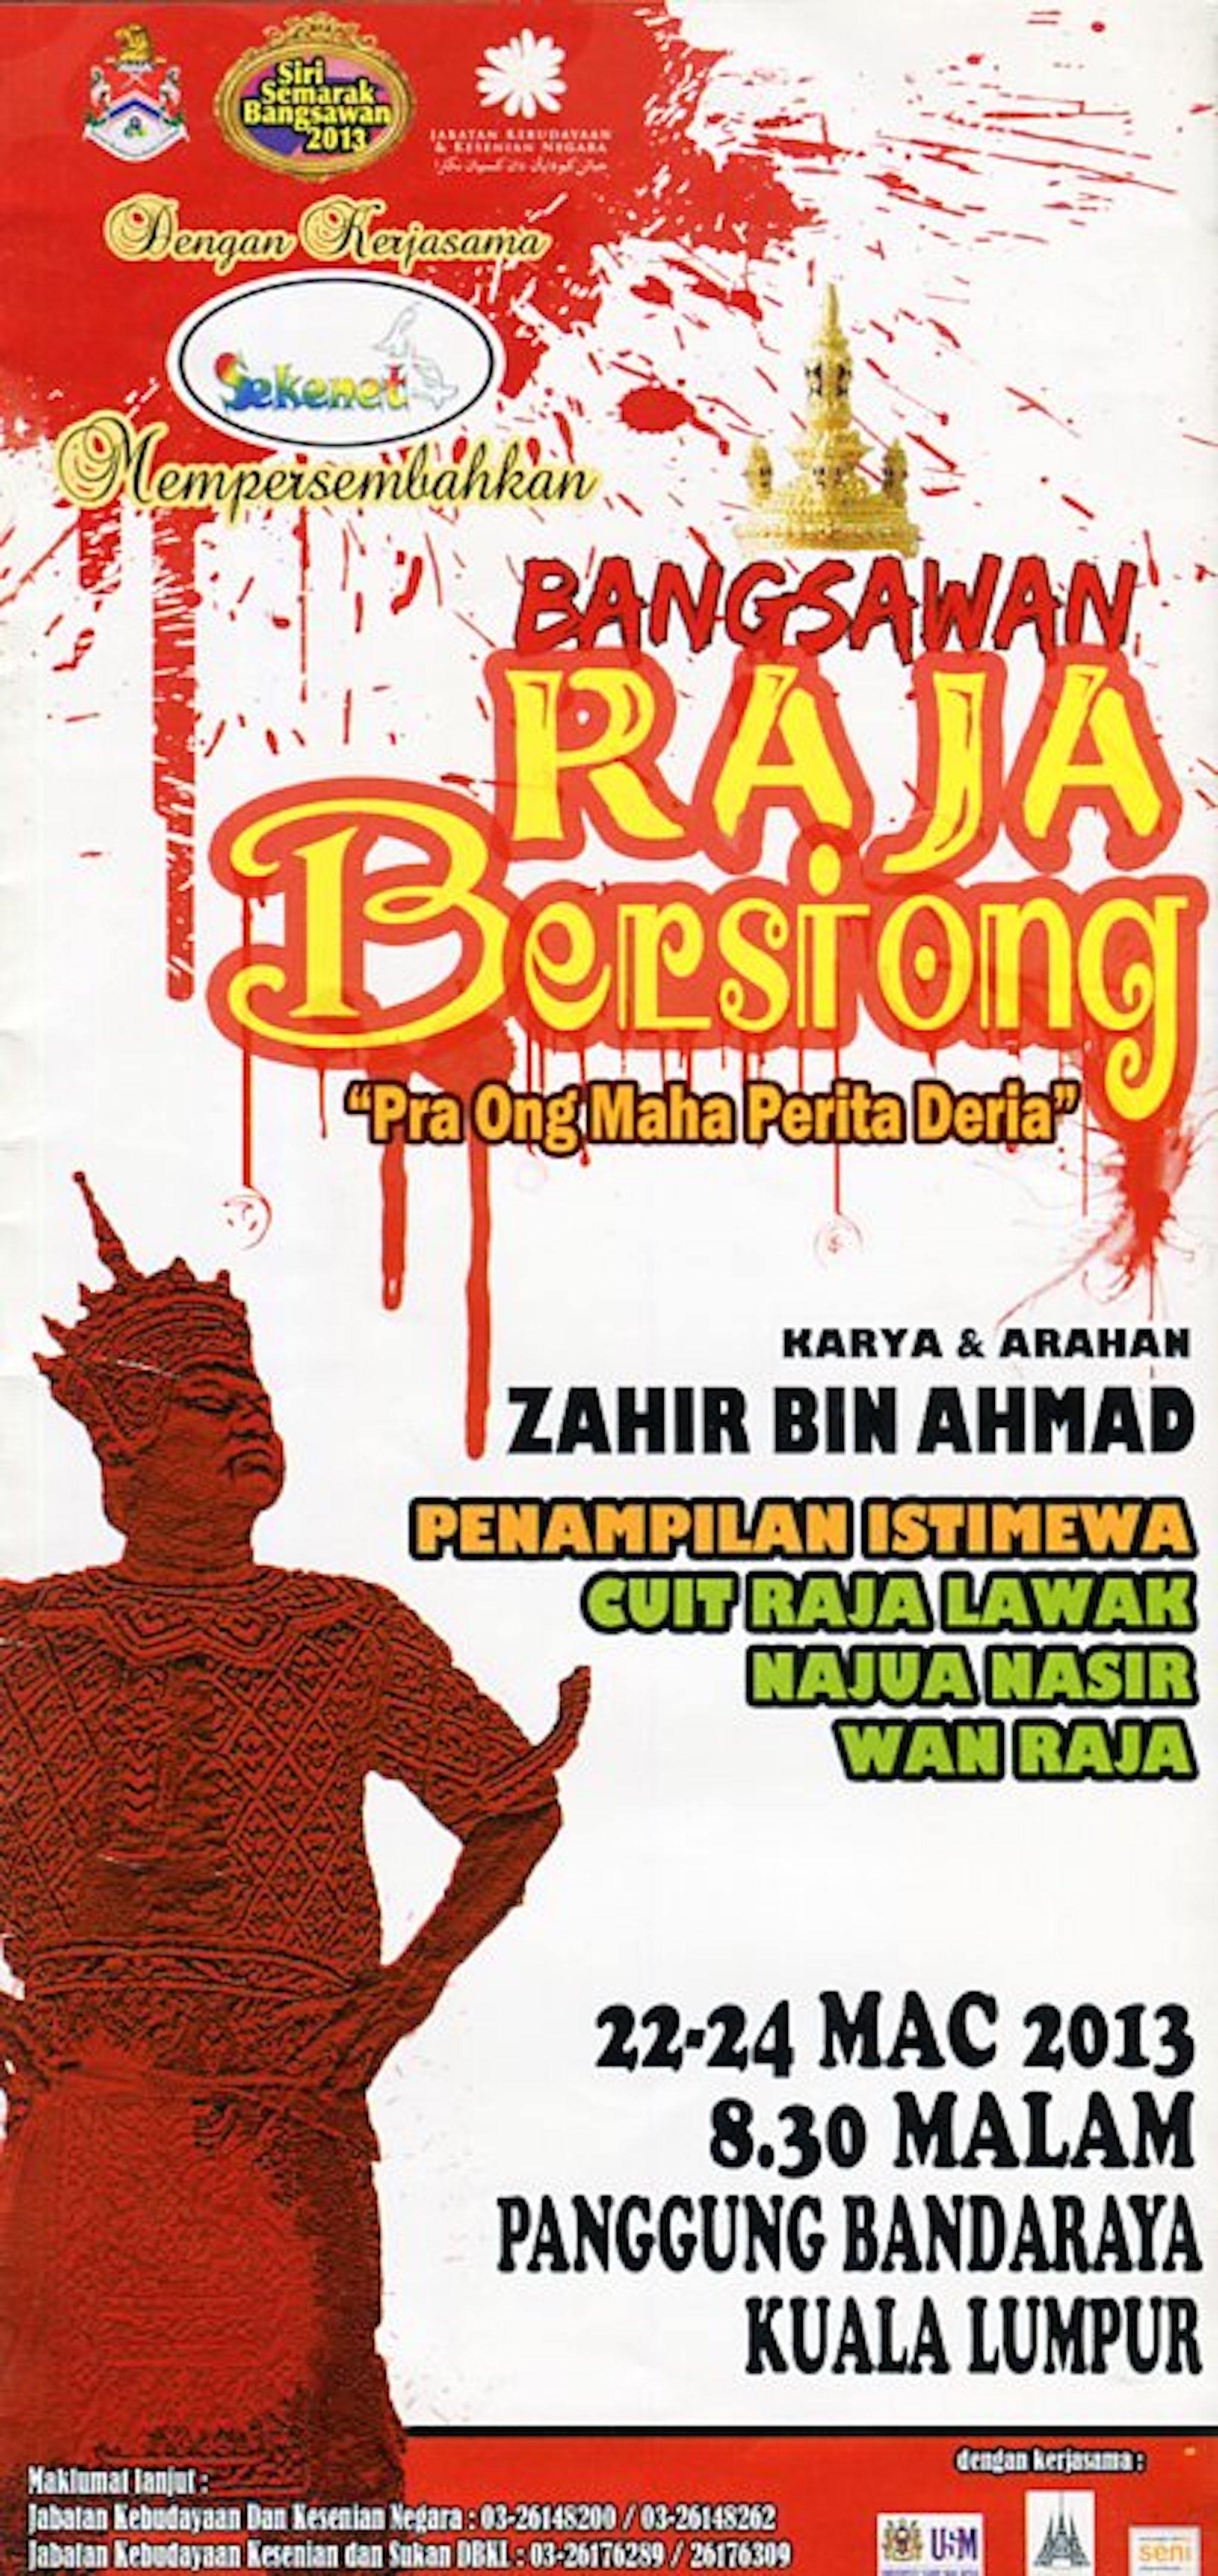 2013 Bangsawan Raja Bersiong cover